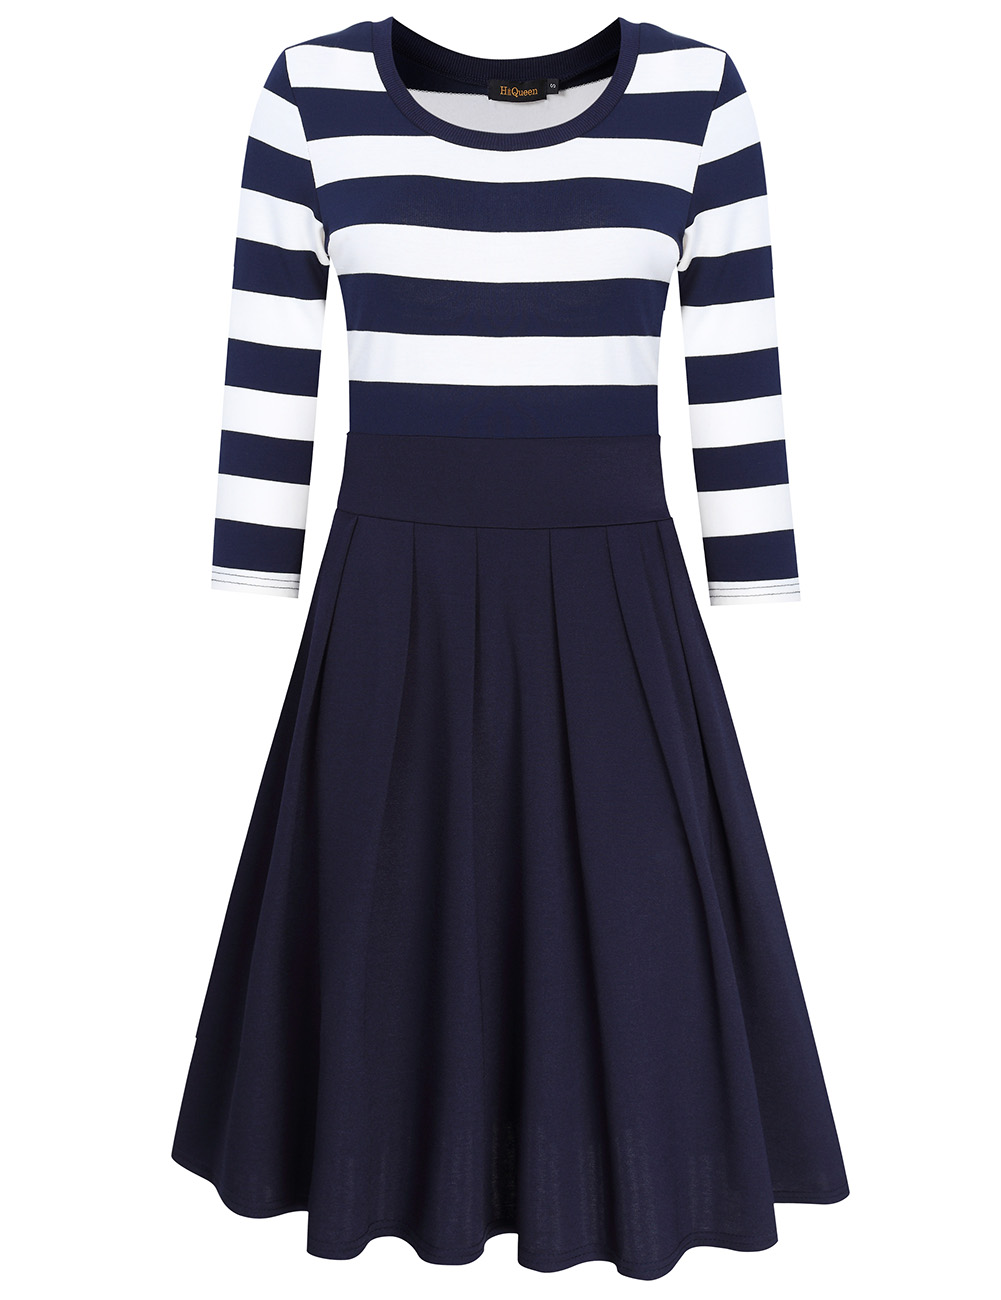 HiQueen Women Casual Scoop Neck 3/4 Sleeve A-Line Swing Dress Stripe Modest Dresses Dark blue_XL